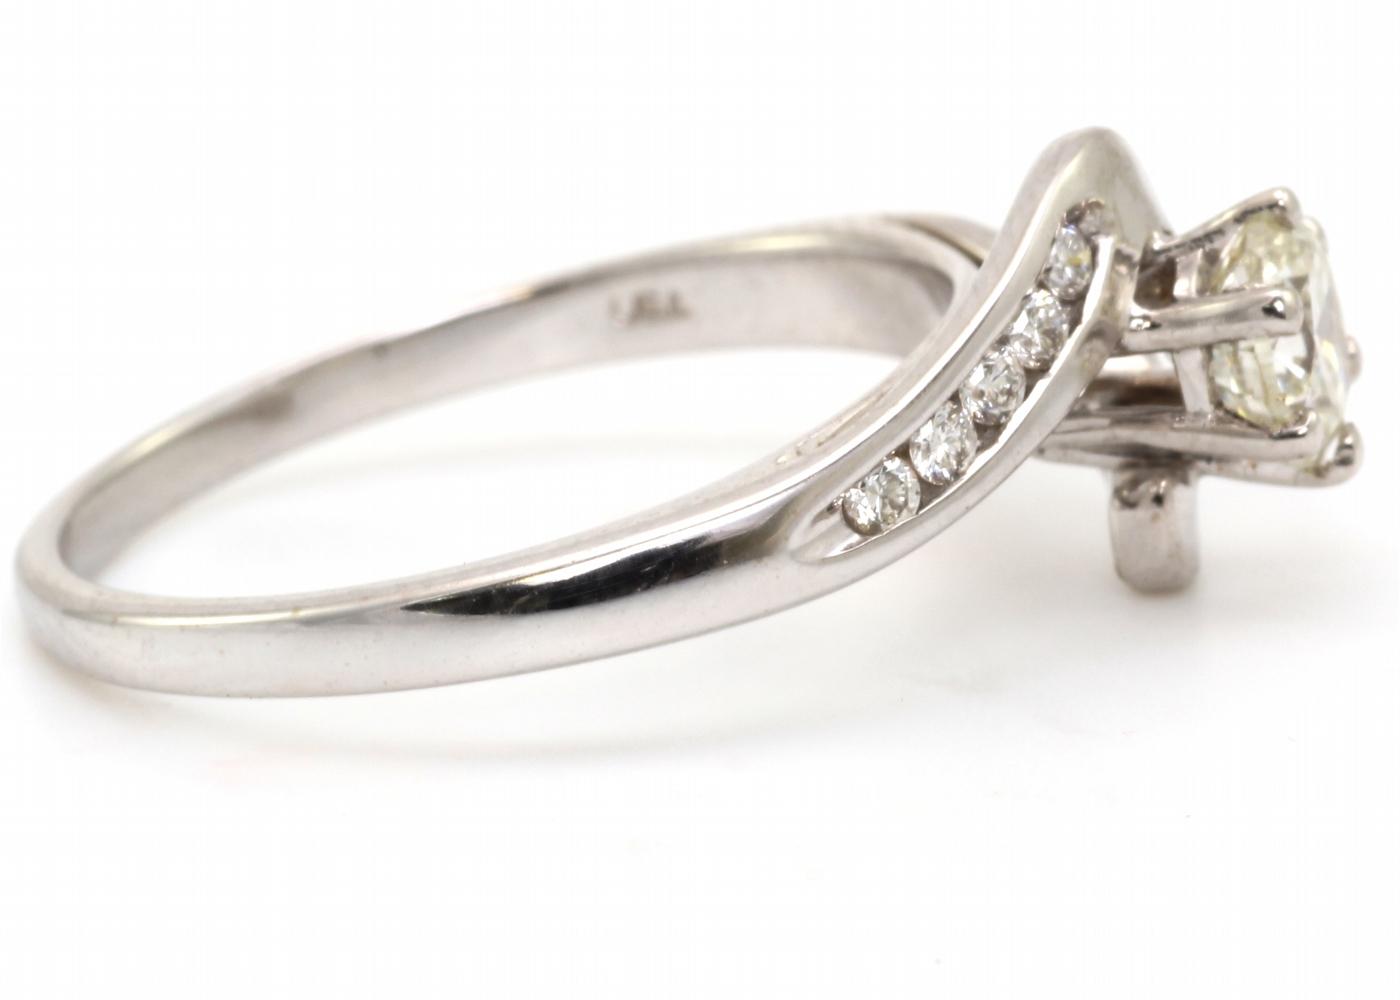 18k White Gold Single Stone Diamond Ring 0.65 Carats - Image 3 of 4